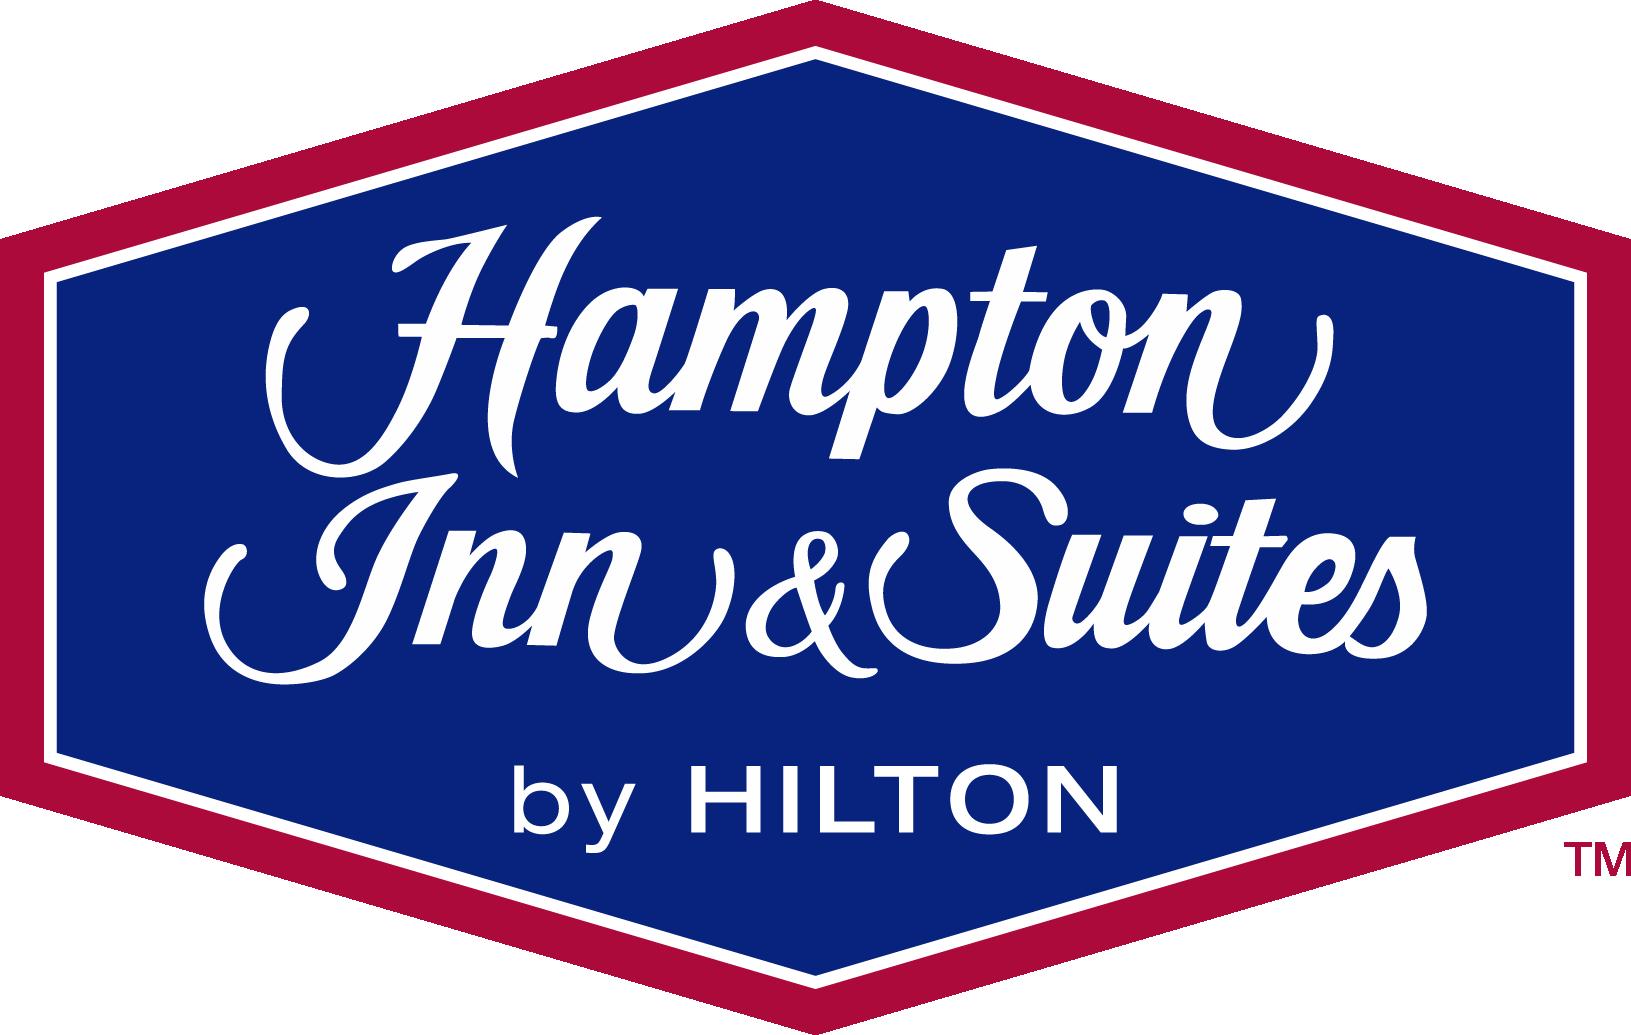 Hampton Inn & Suites Logo color